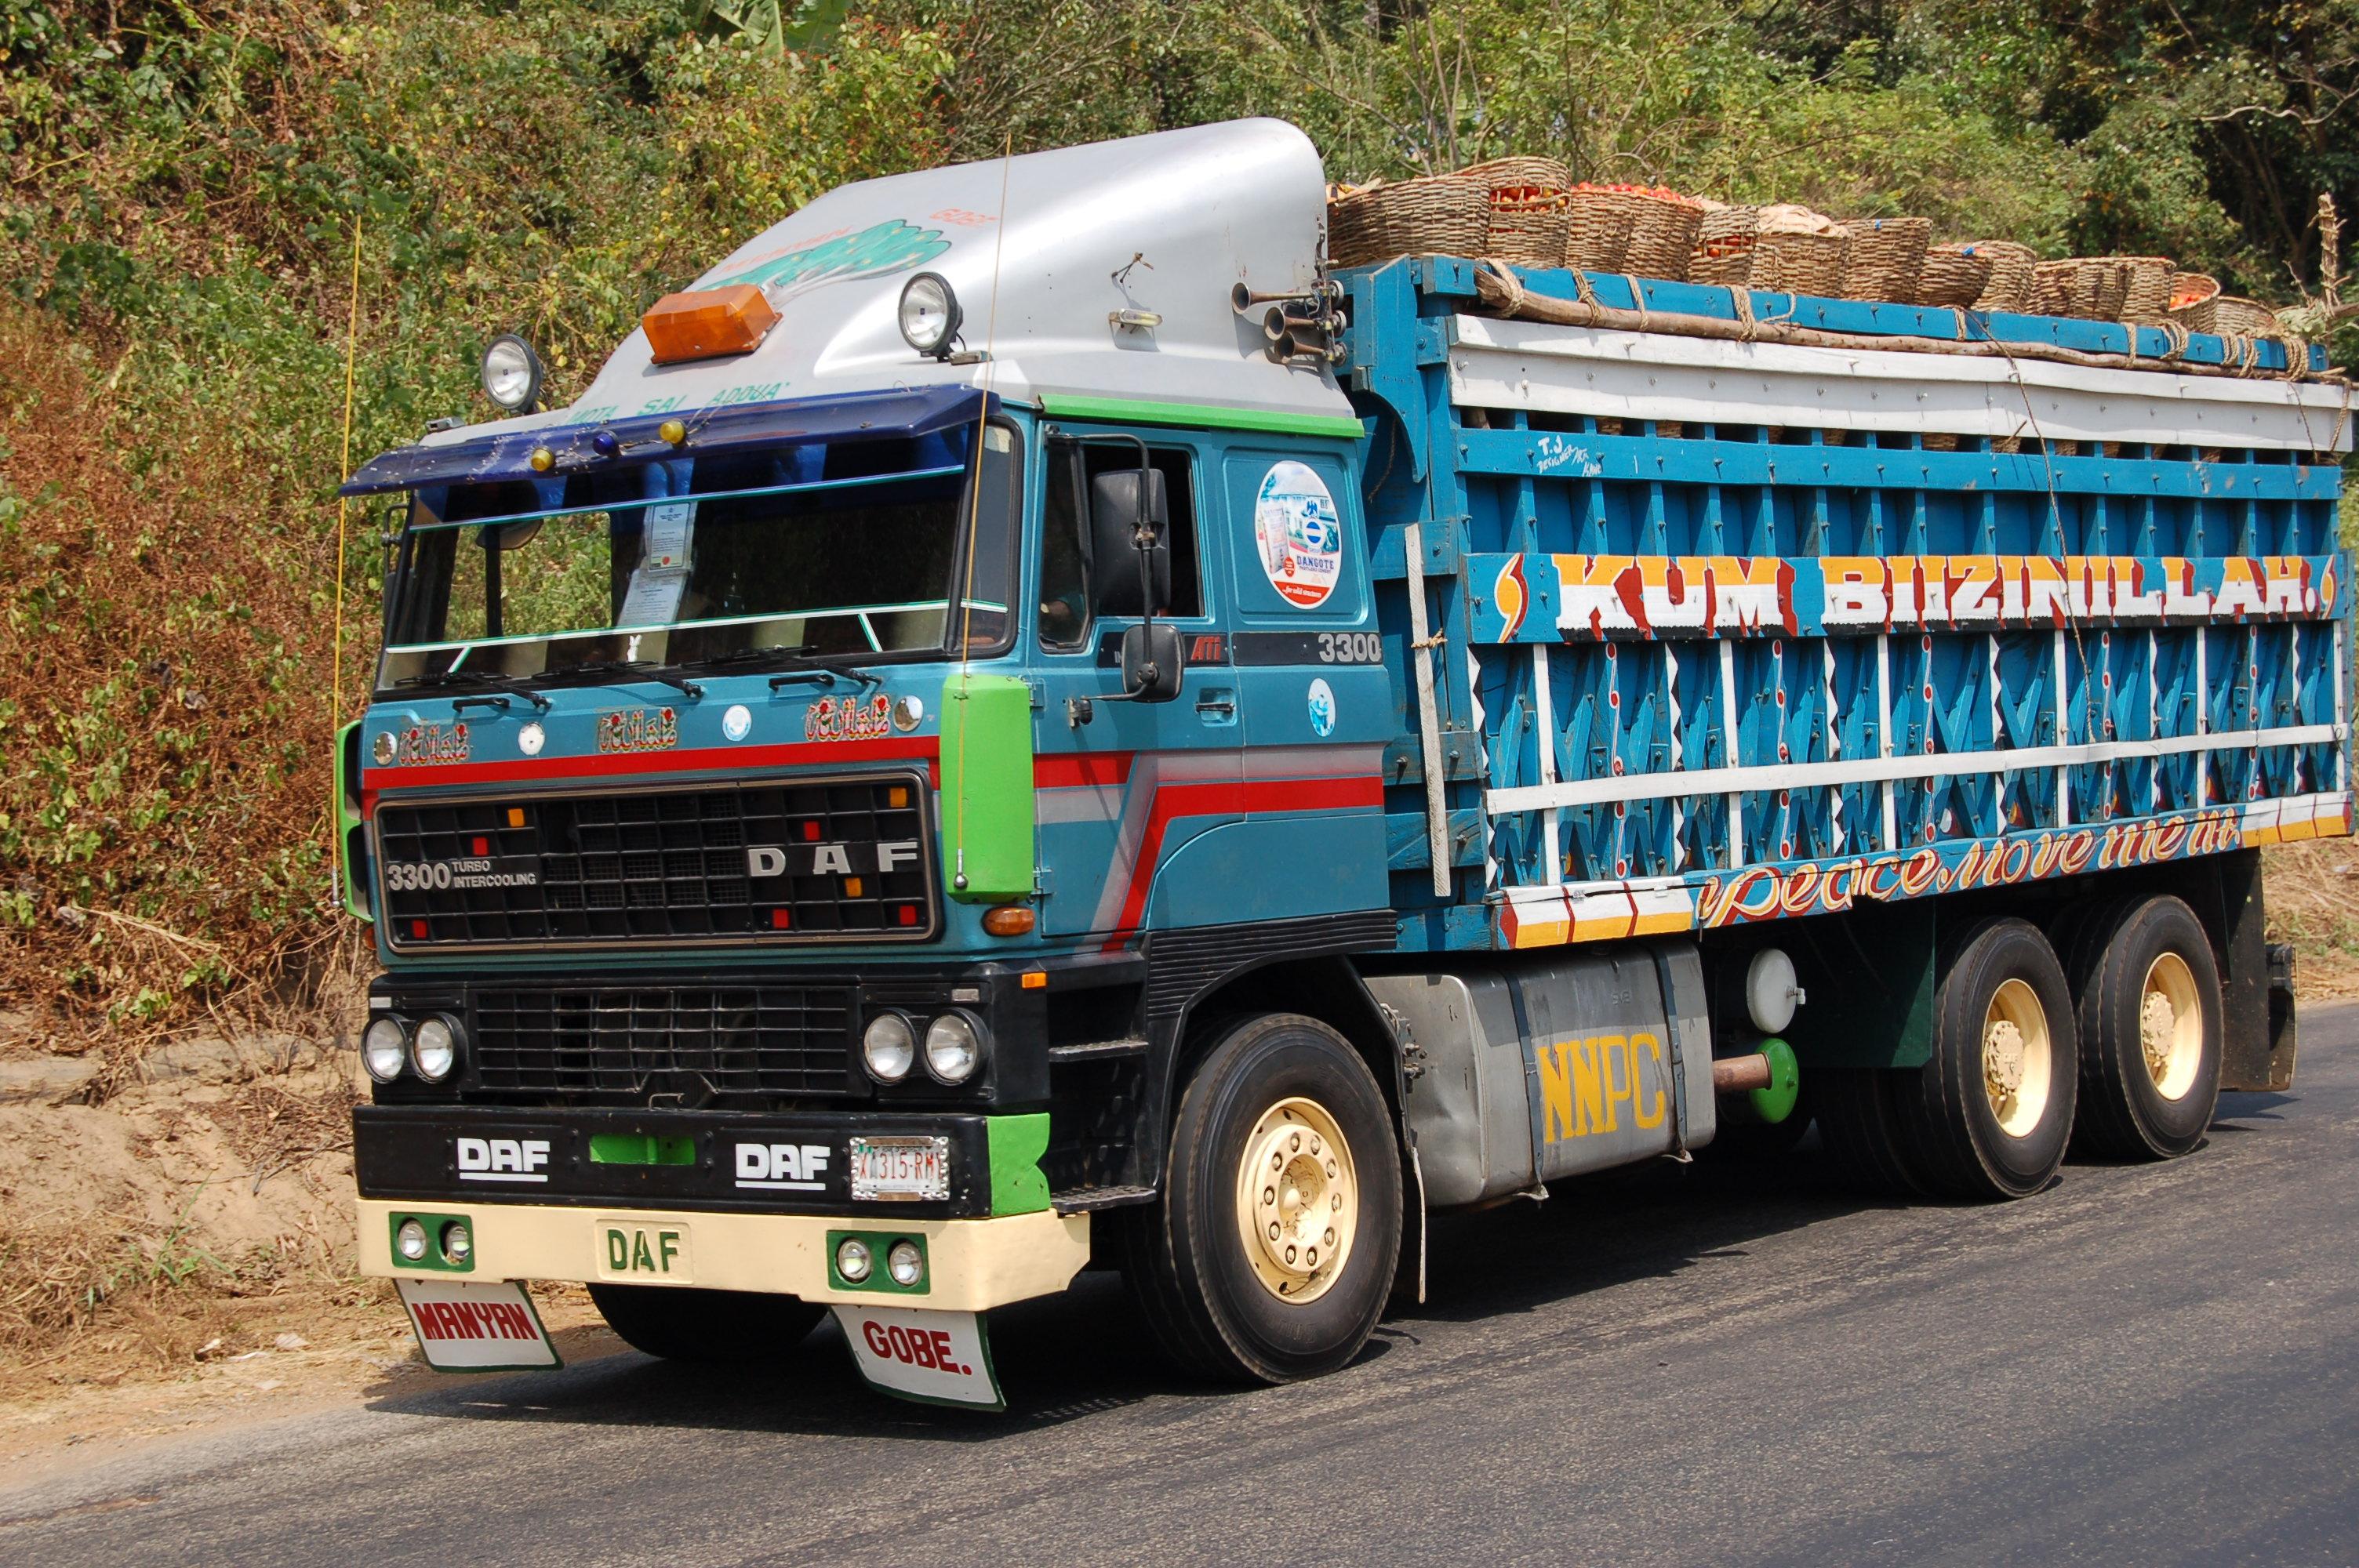 File:DAF truck in Nigeria.jpg - Wikimedia Commons